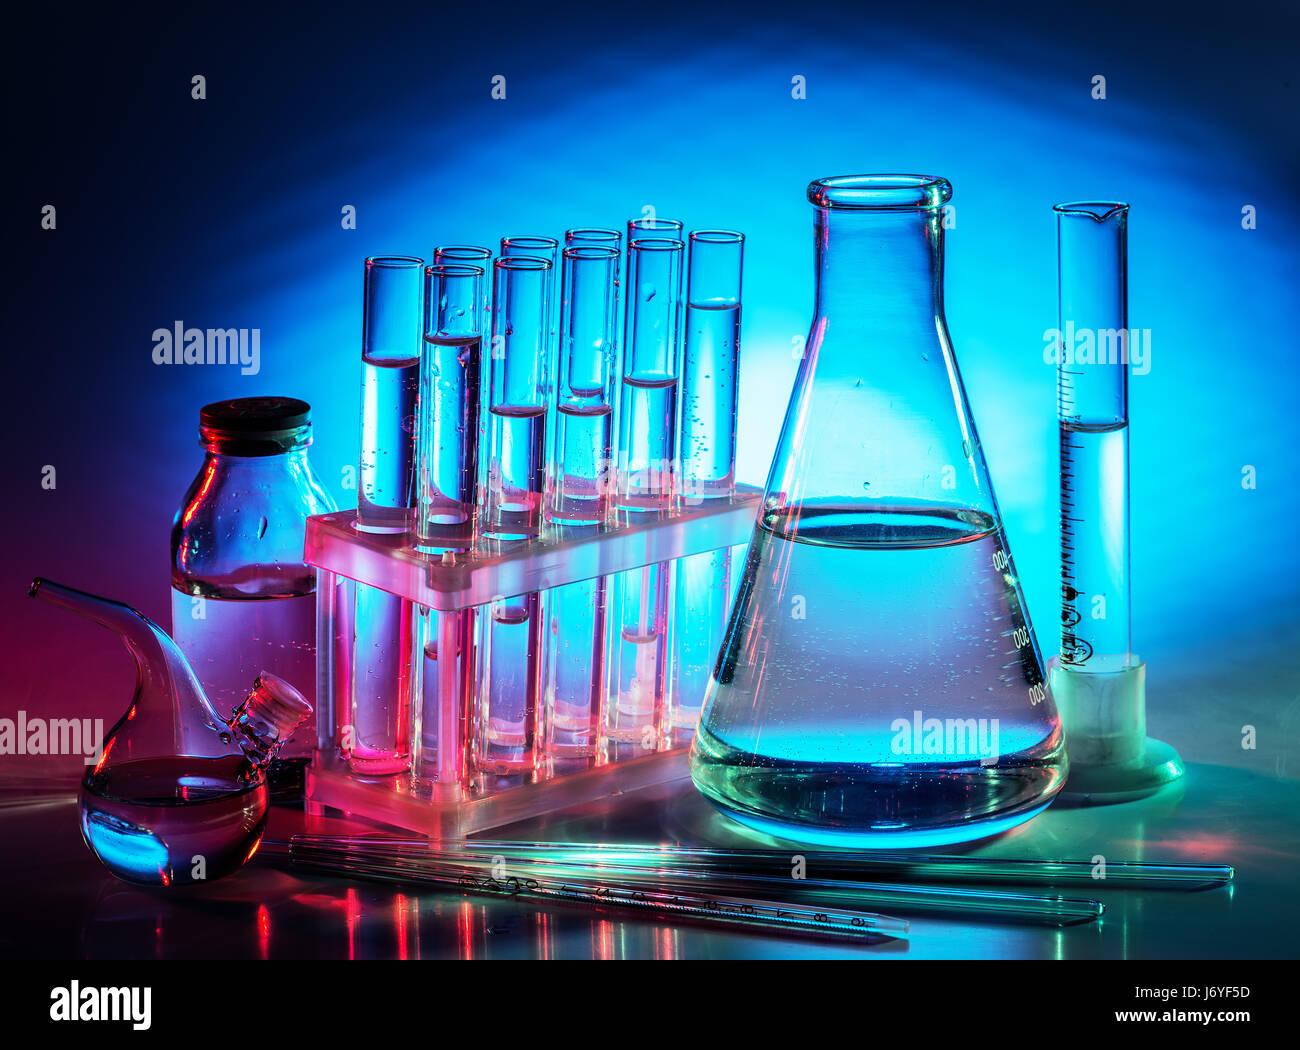 Different laboratory beakers and glassware. Multicolored. Stock Photo